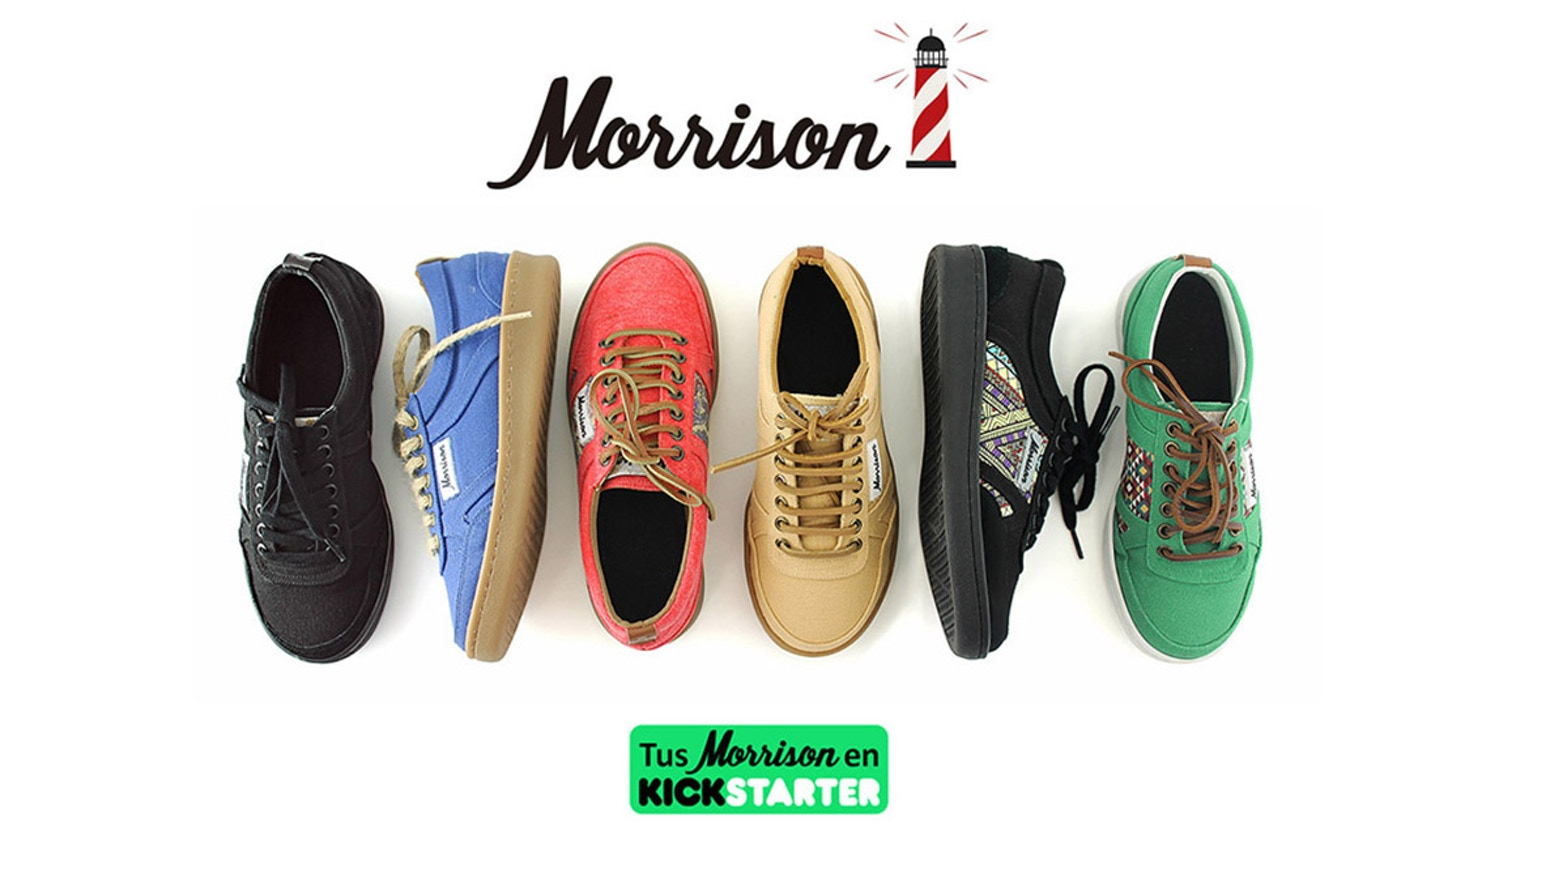 4d33642b2 Morrison is an 100% Spanish sneakers brand with online shop.   Morrison es  una marca 100% española y exclusivamente online.